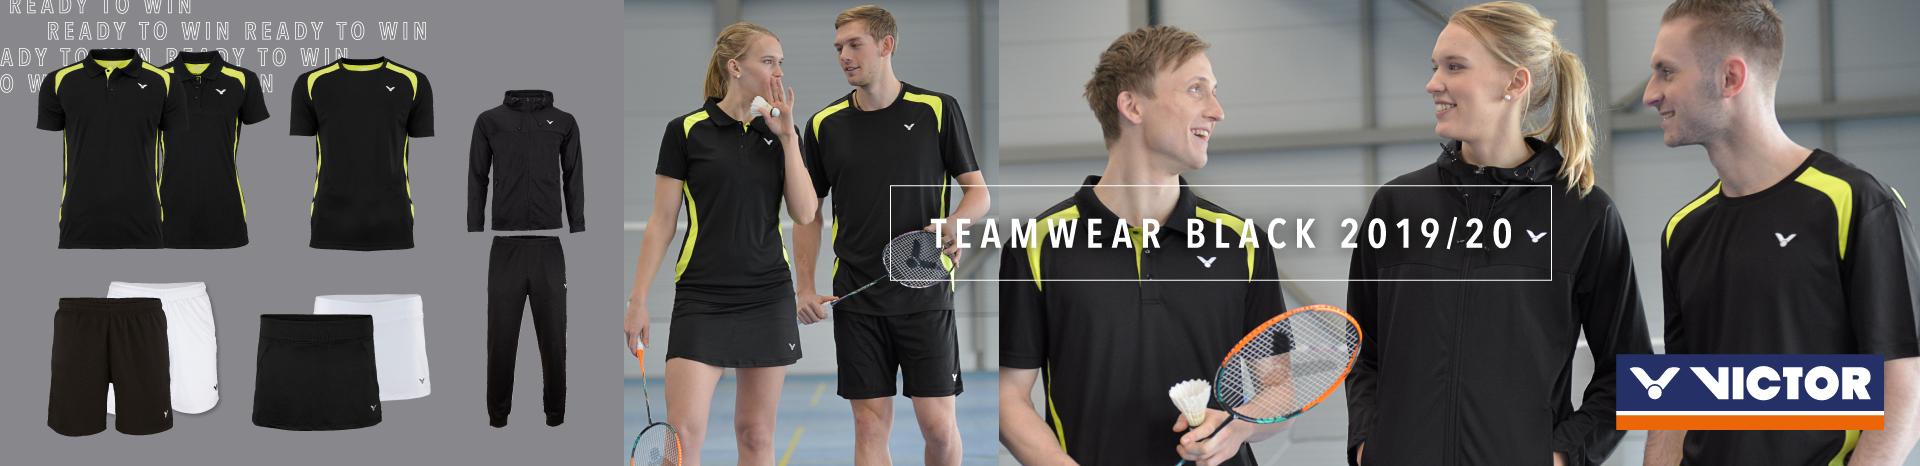 Victor Teamwear black